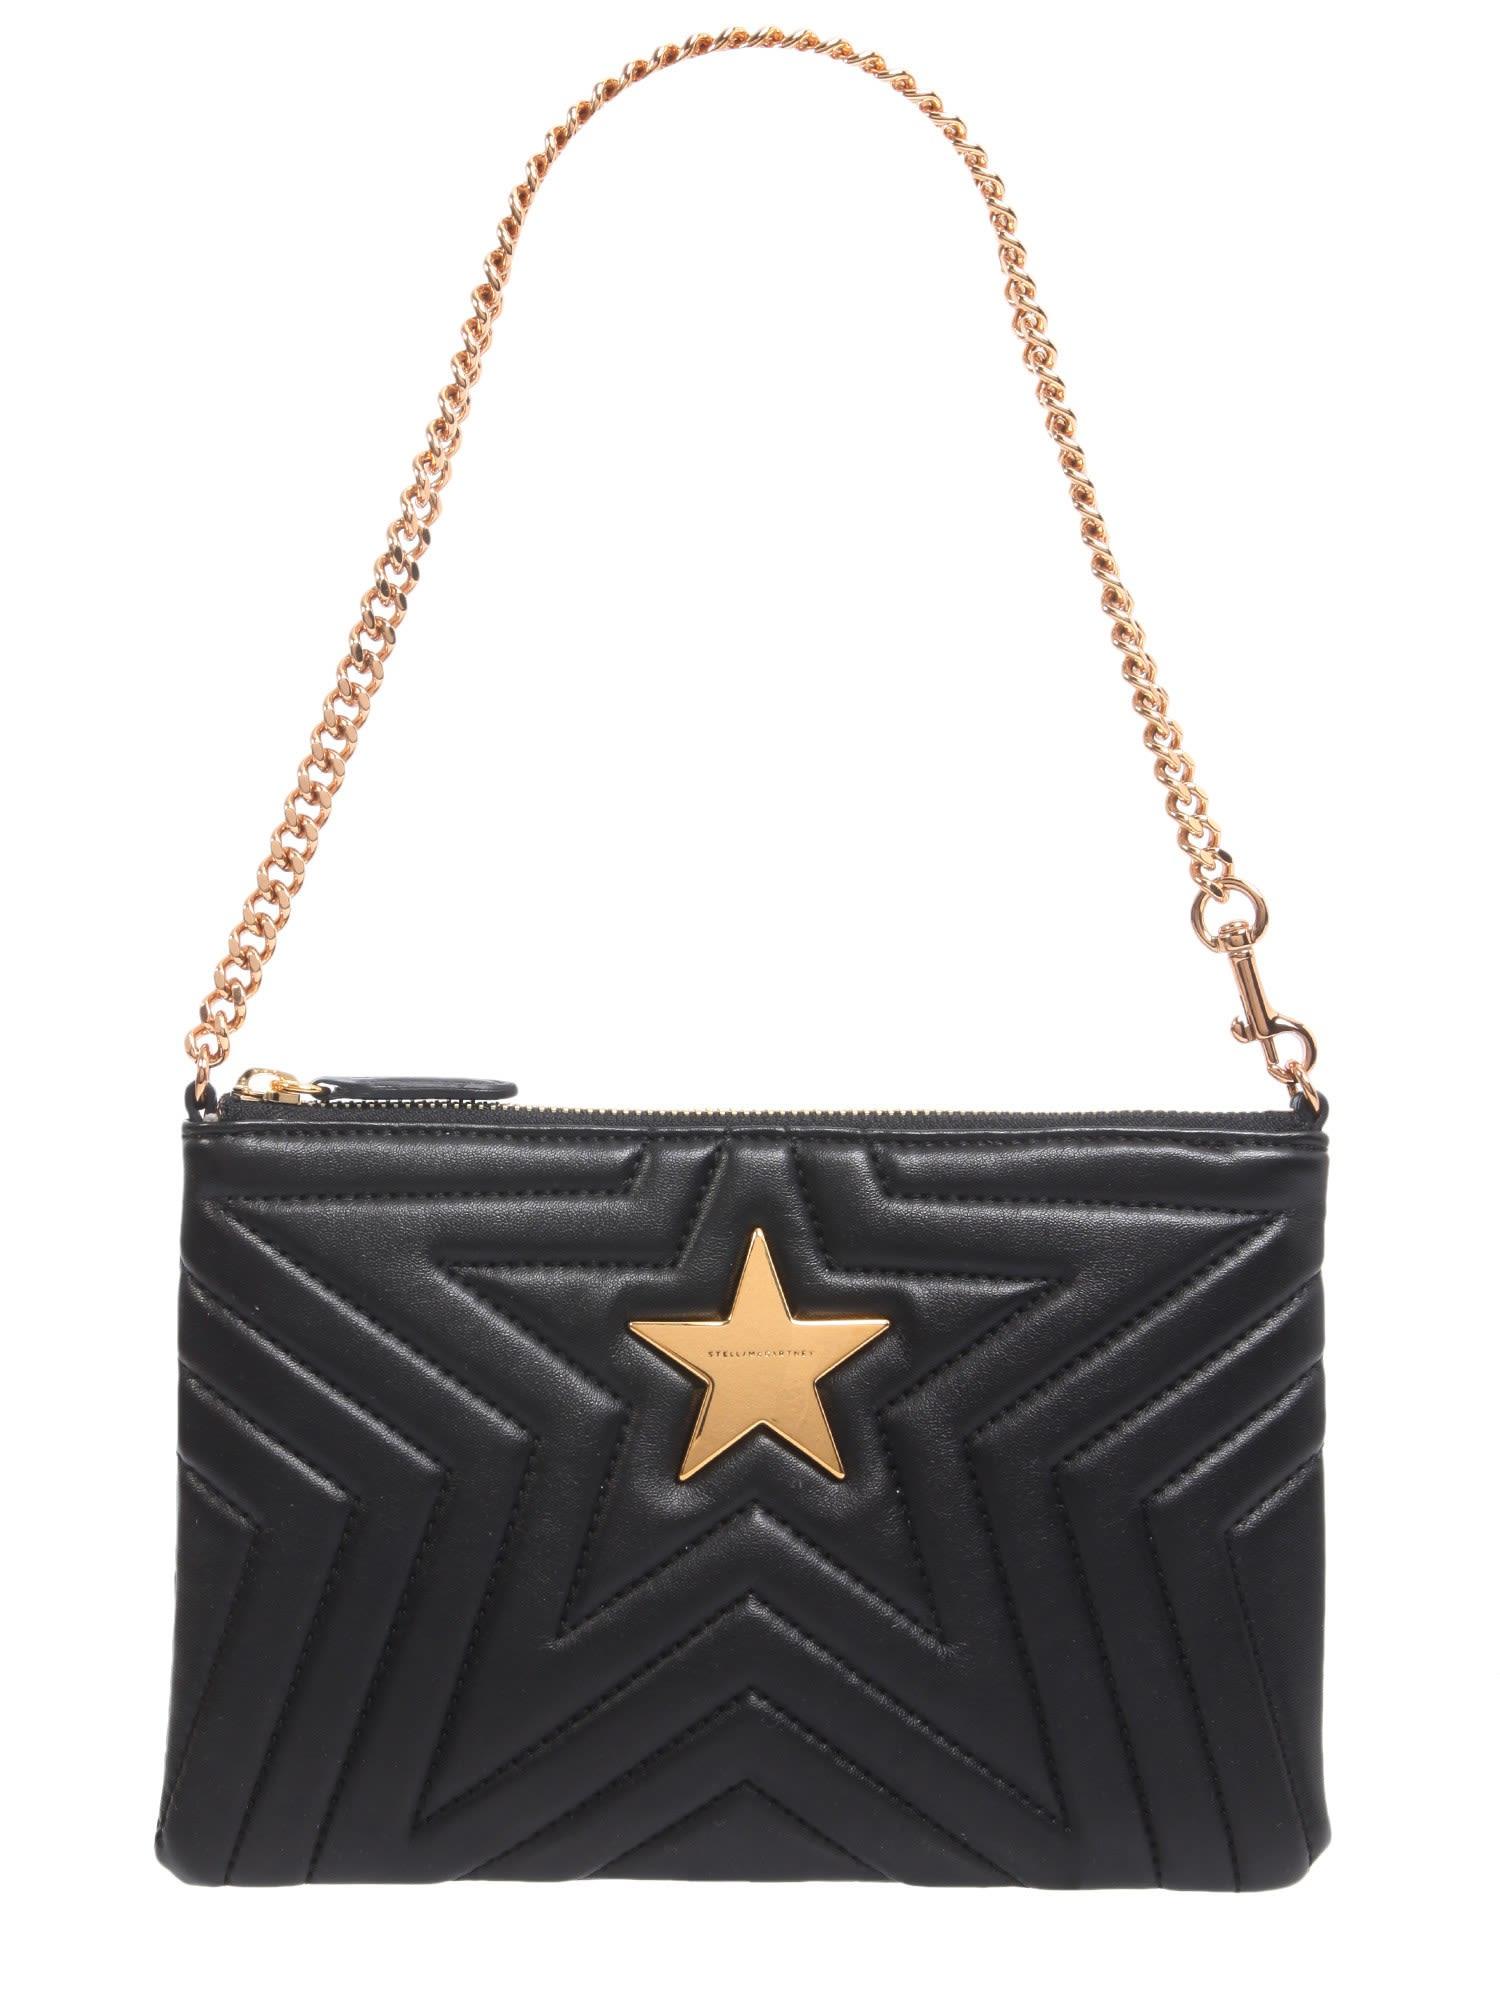 Quited Stella Star Clutch in Black